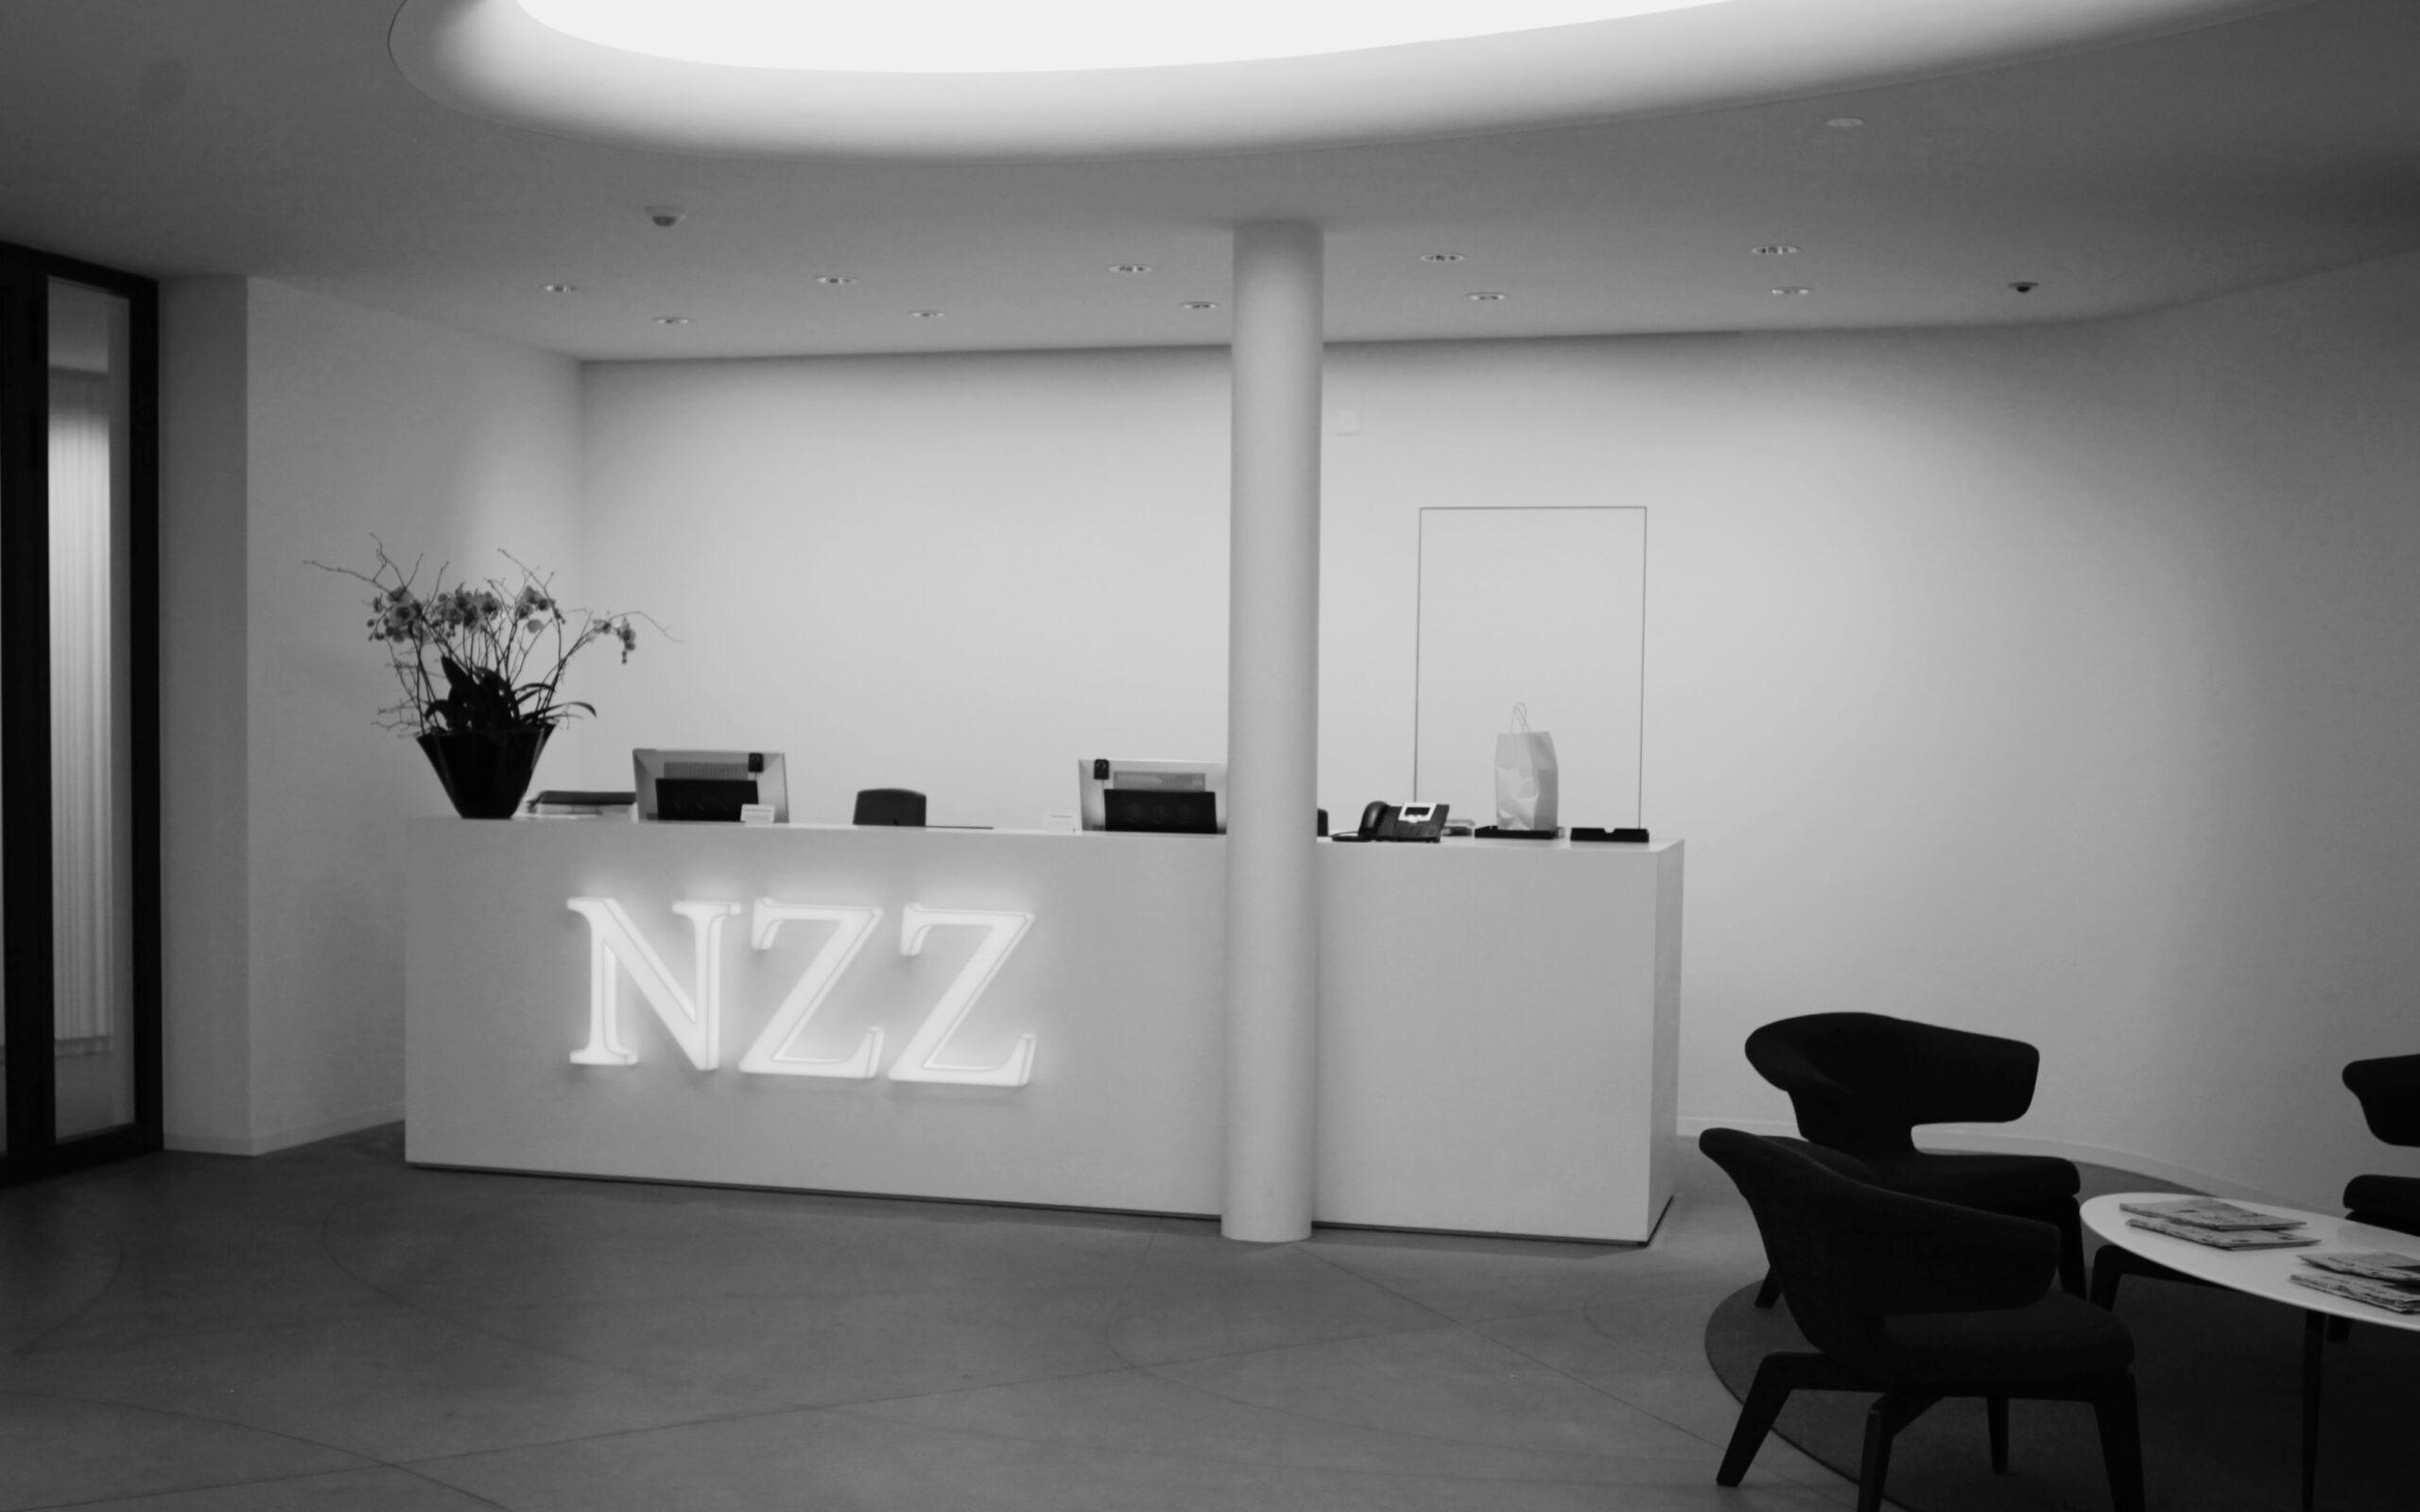 branding_nzz_7